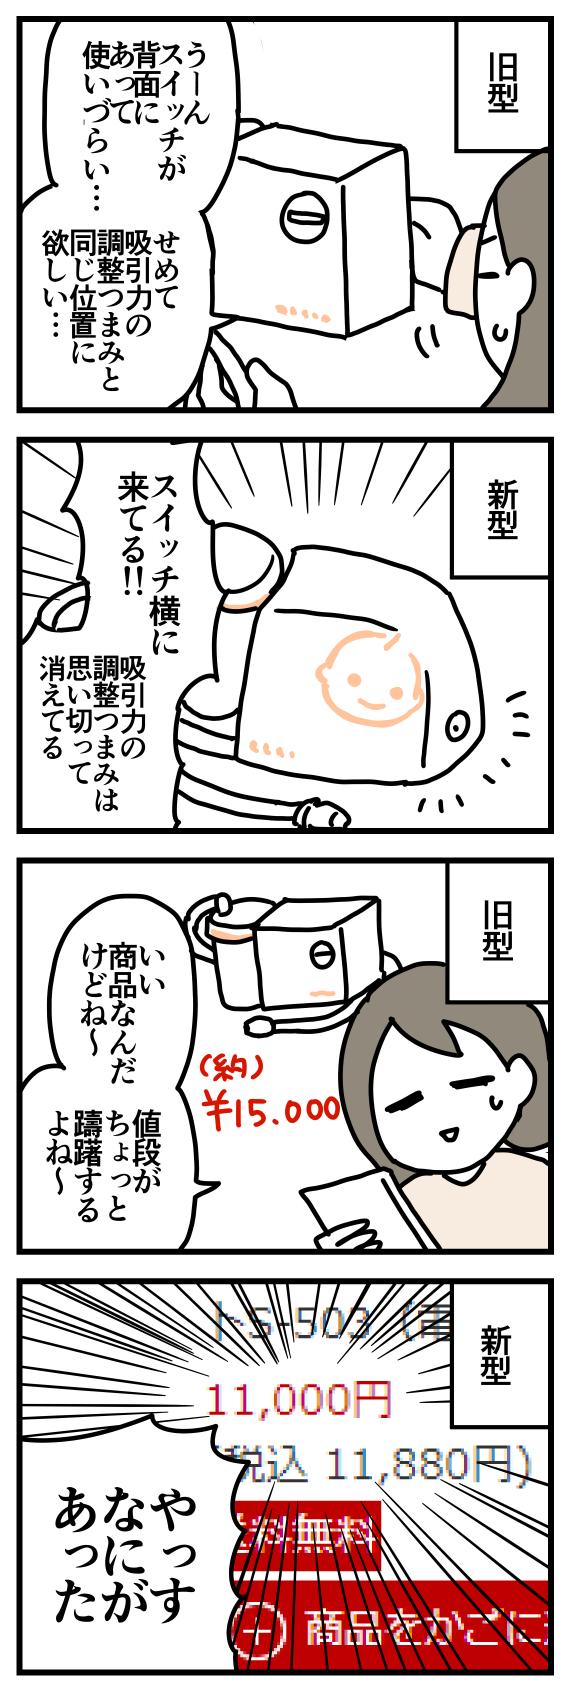 f:id:kanemotonomukuu:20180116123714j:plain